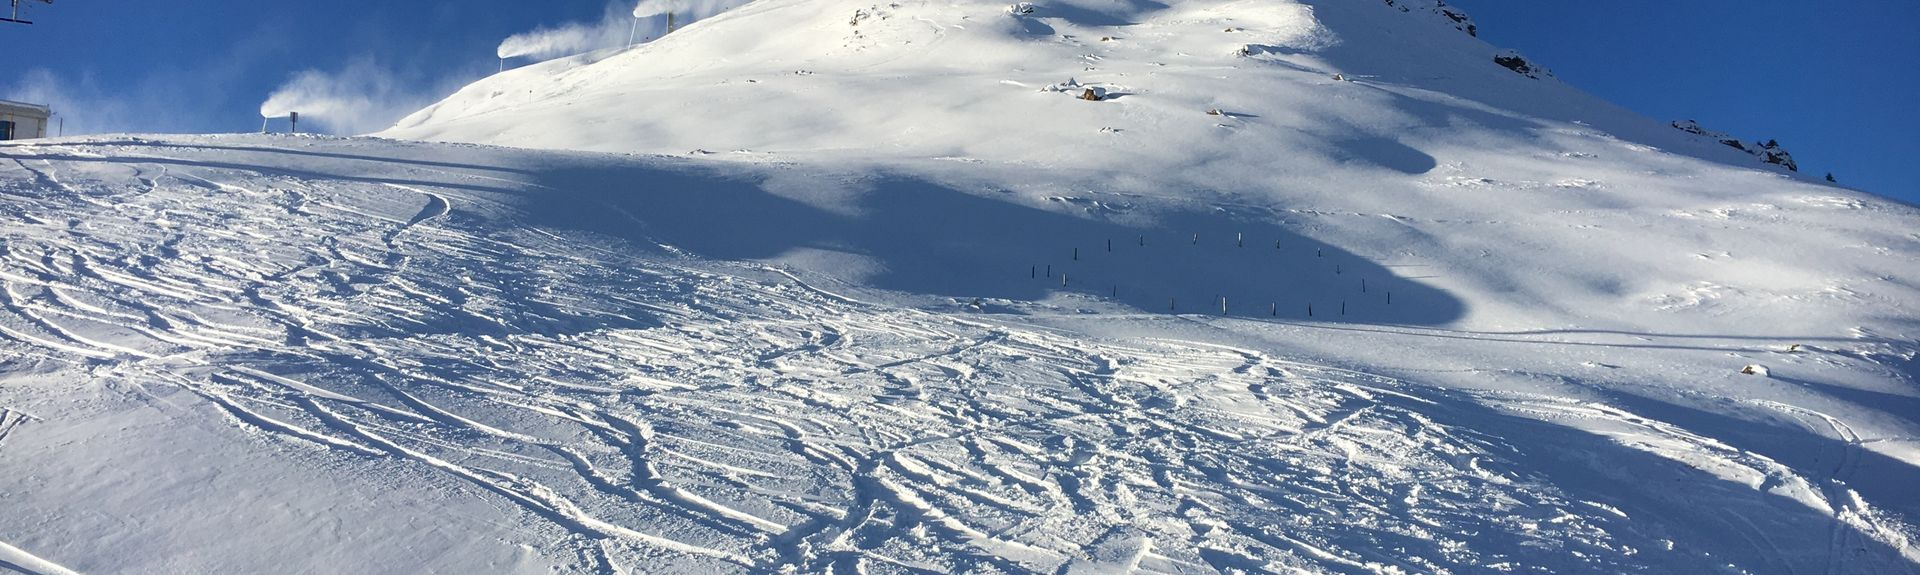 Kitzbühel, Tirol, Austria